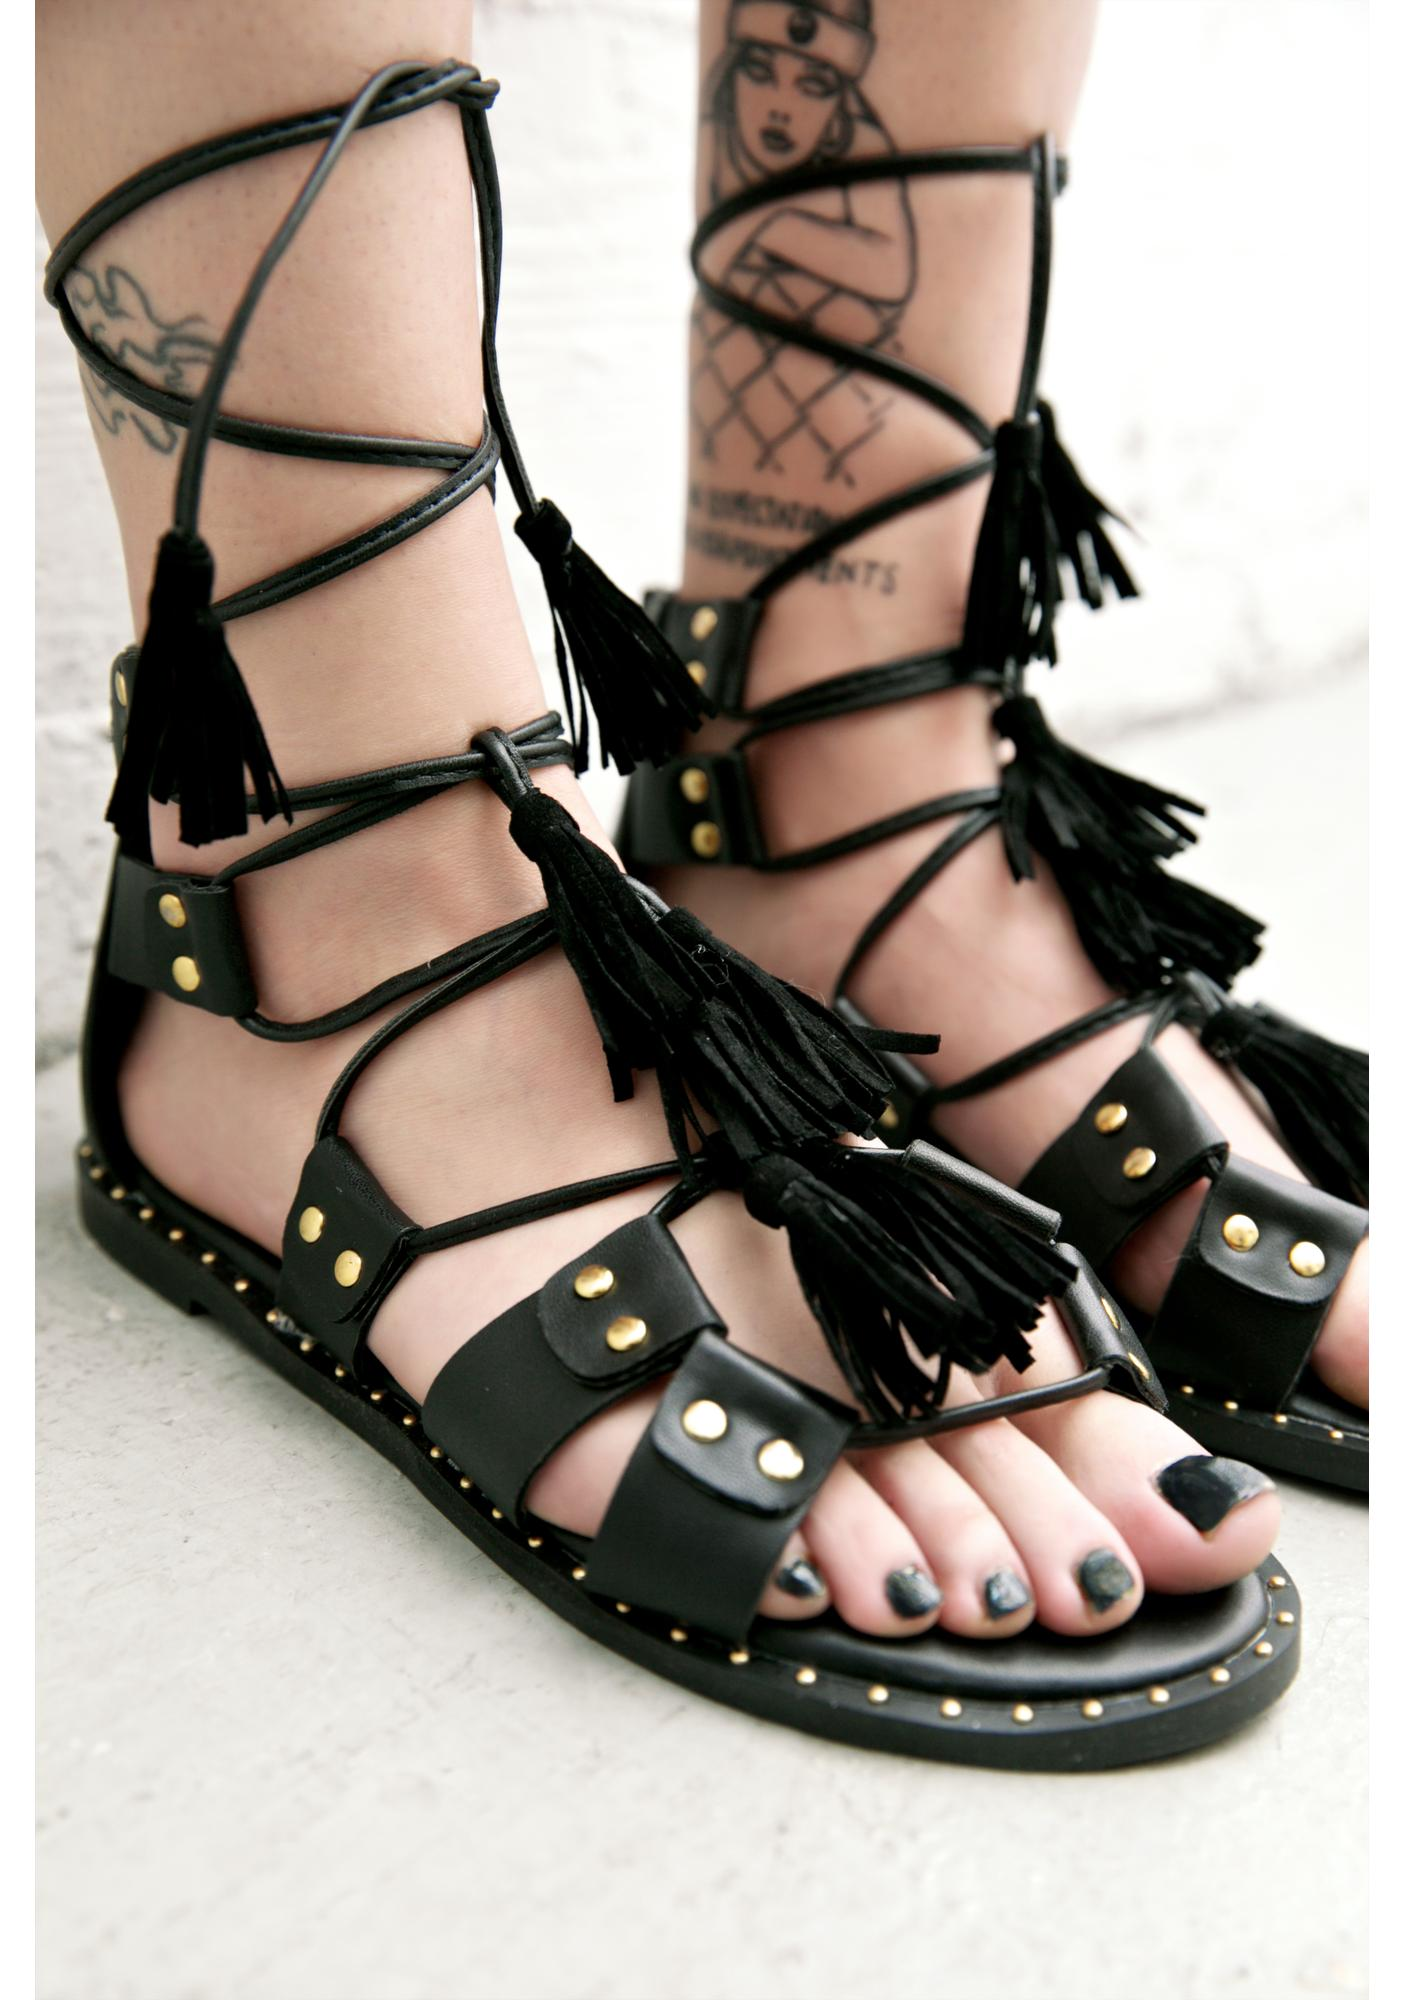 Wayward Heart Sandals